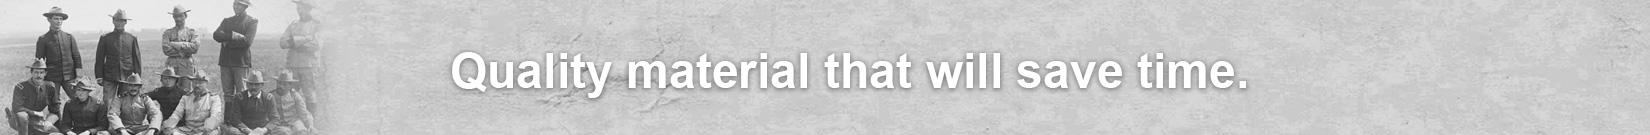 uil high school social studies quality material